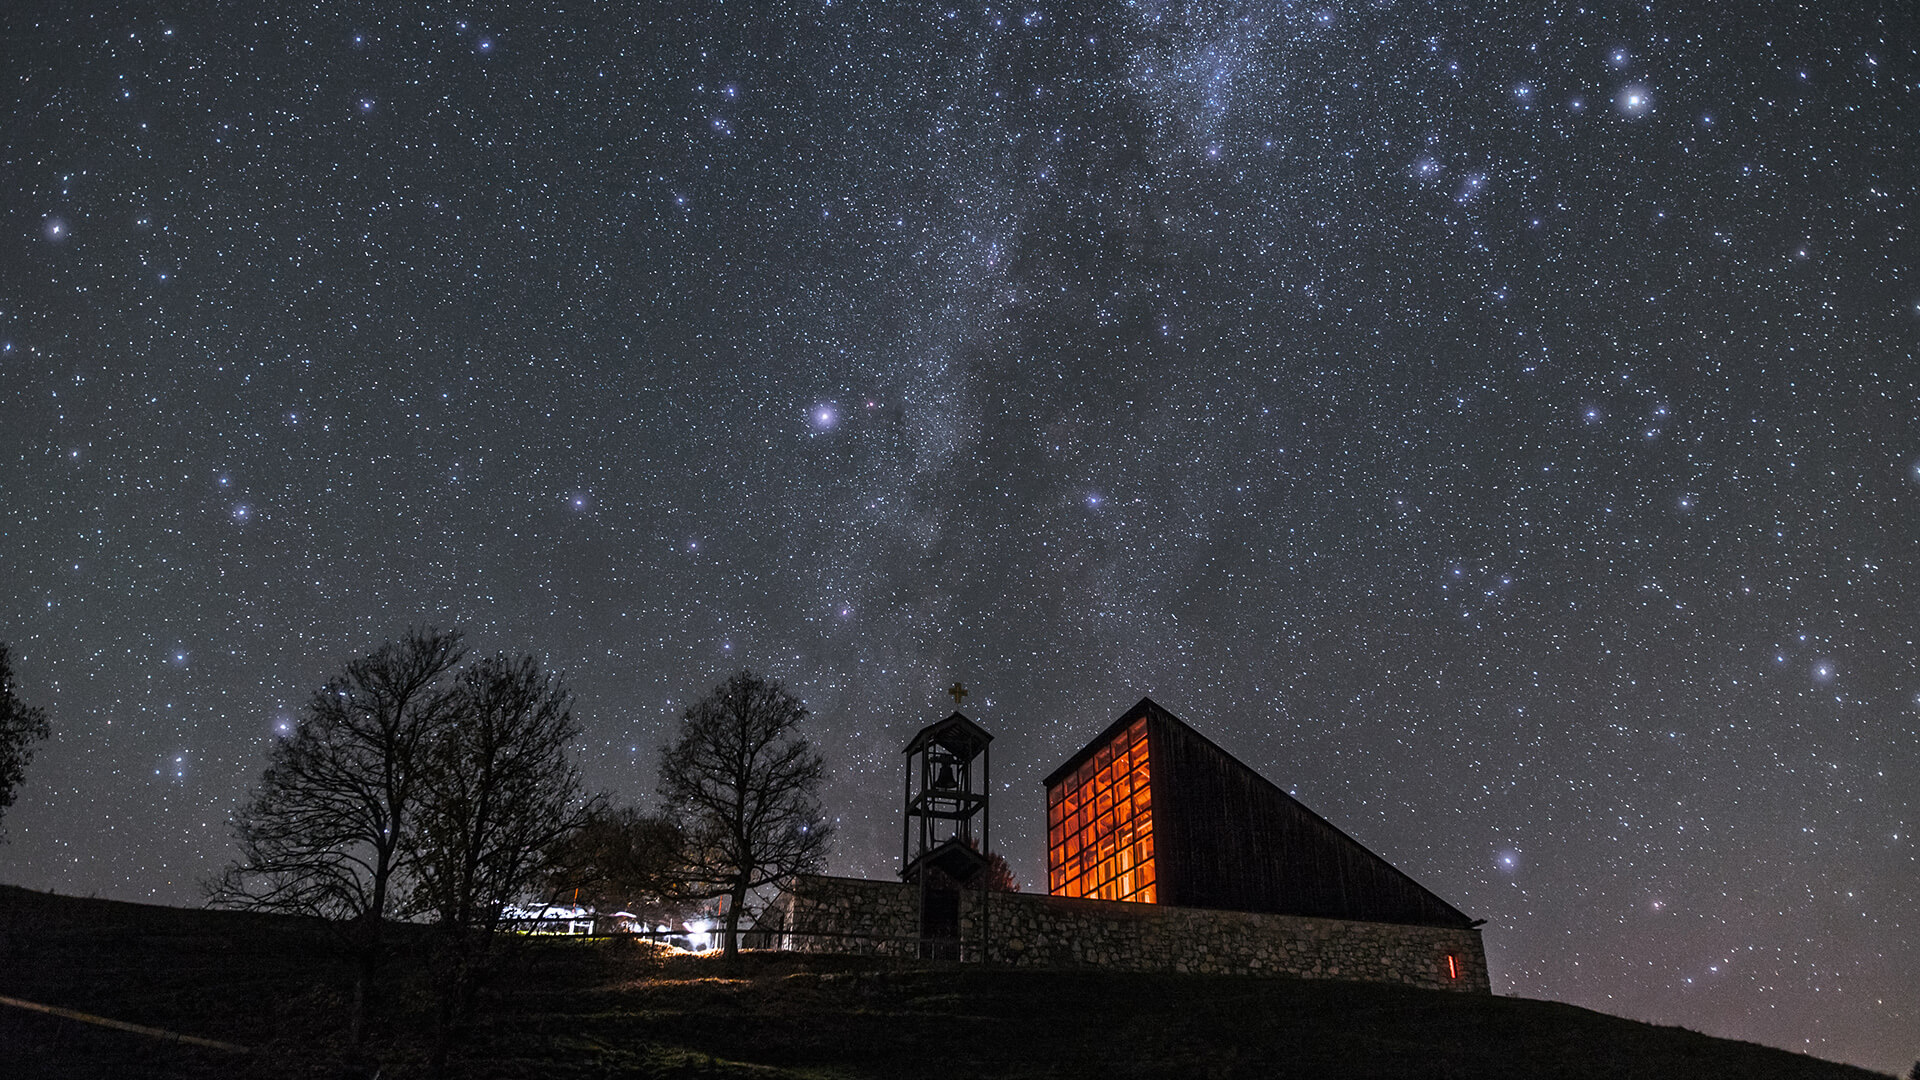 Reit im Winkl: Starry sky over the Winklmoos-Alm star park